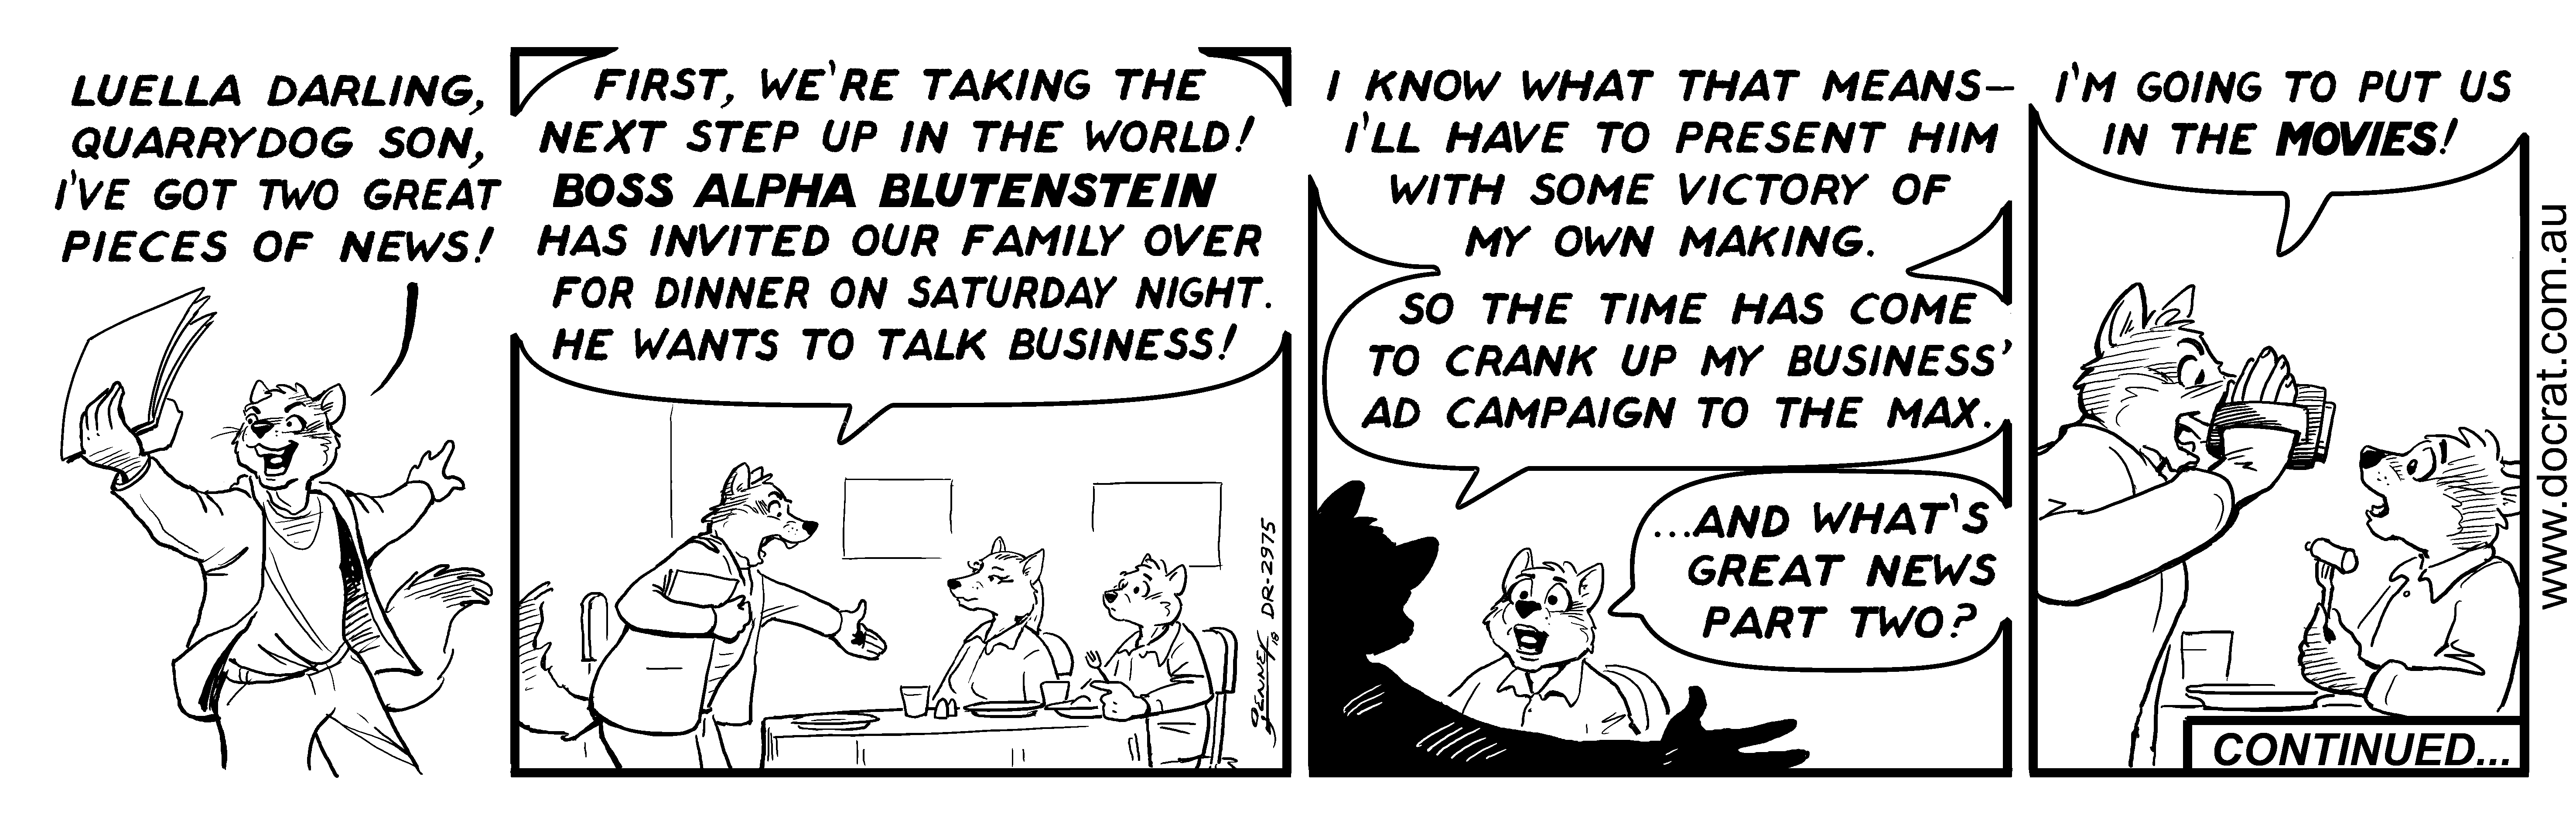 20180216